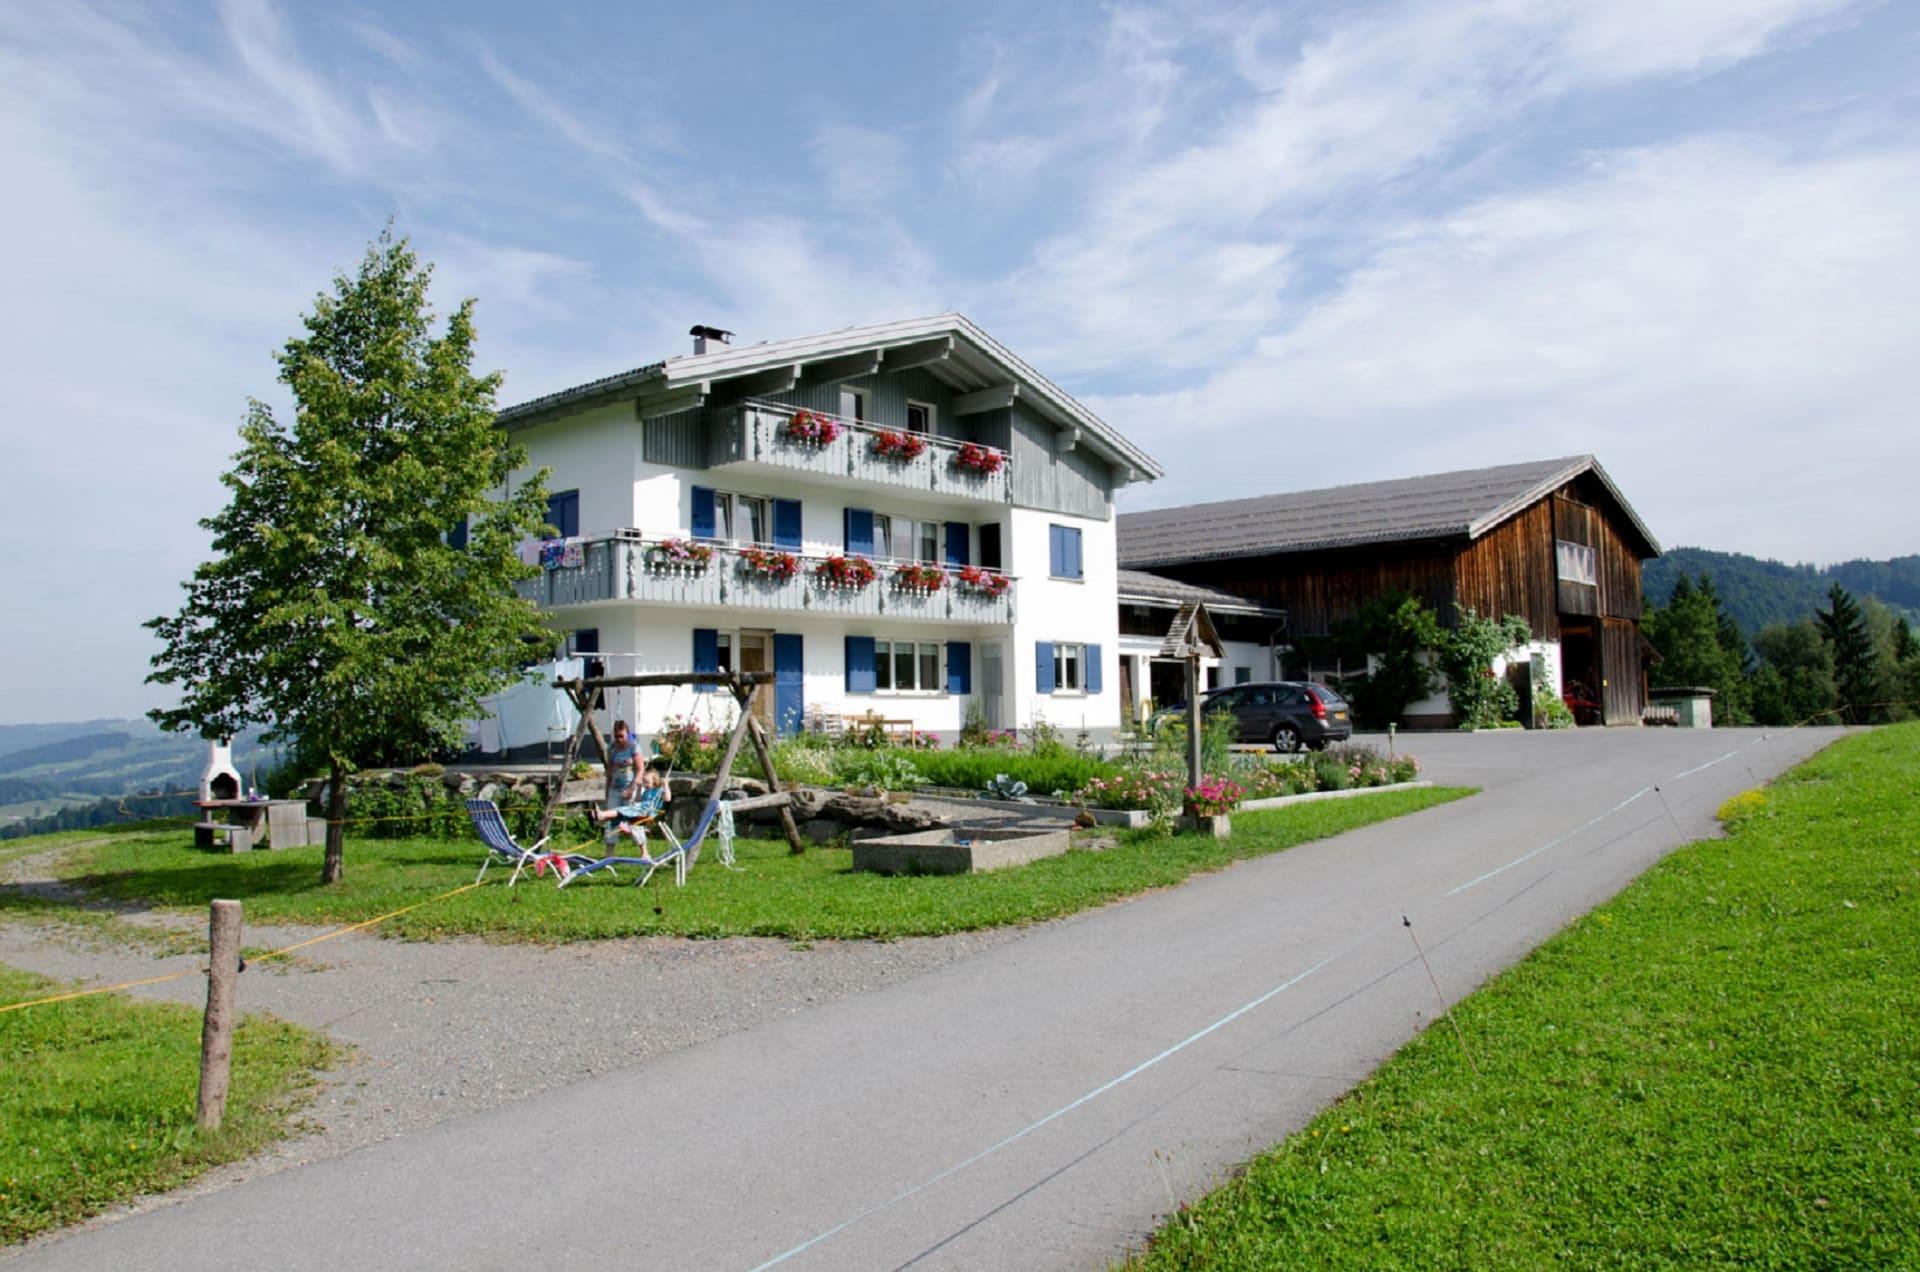 Berghof Vöglerbrand